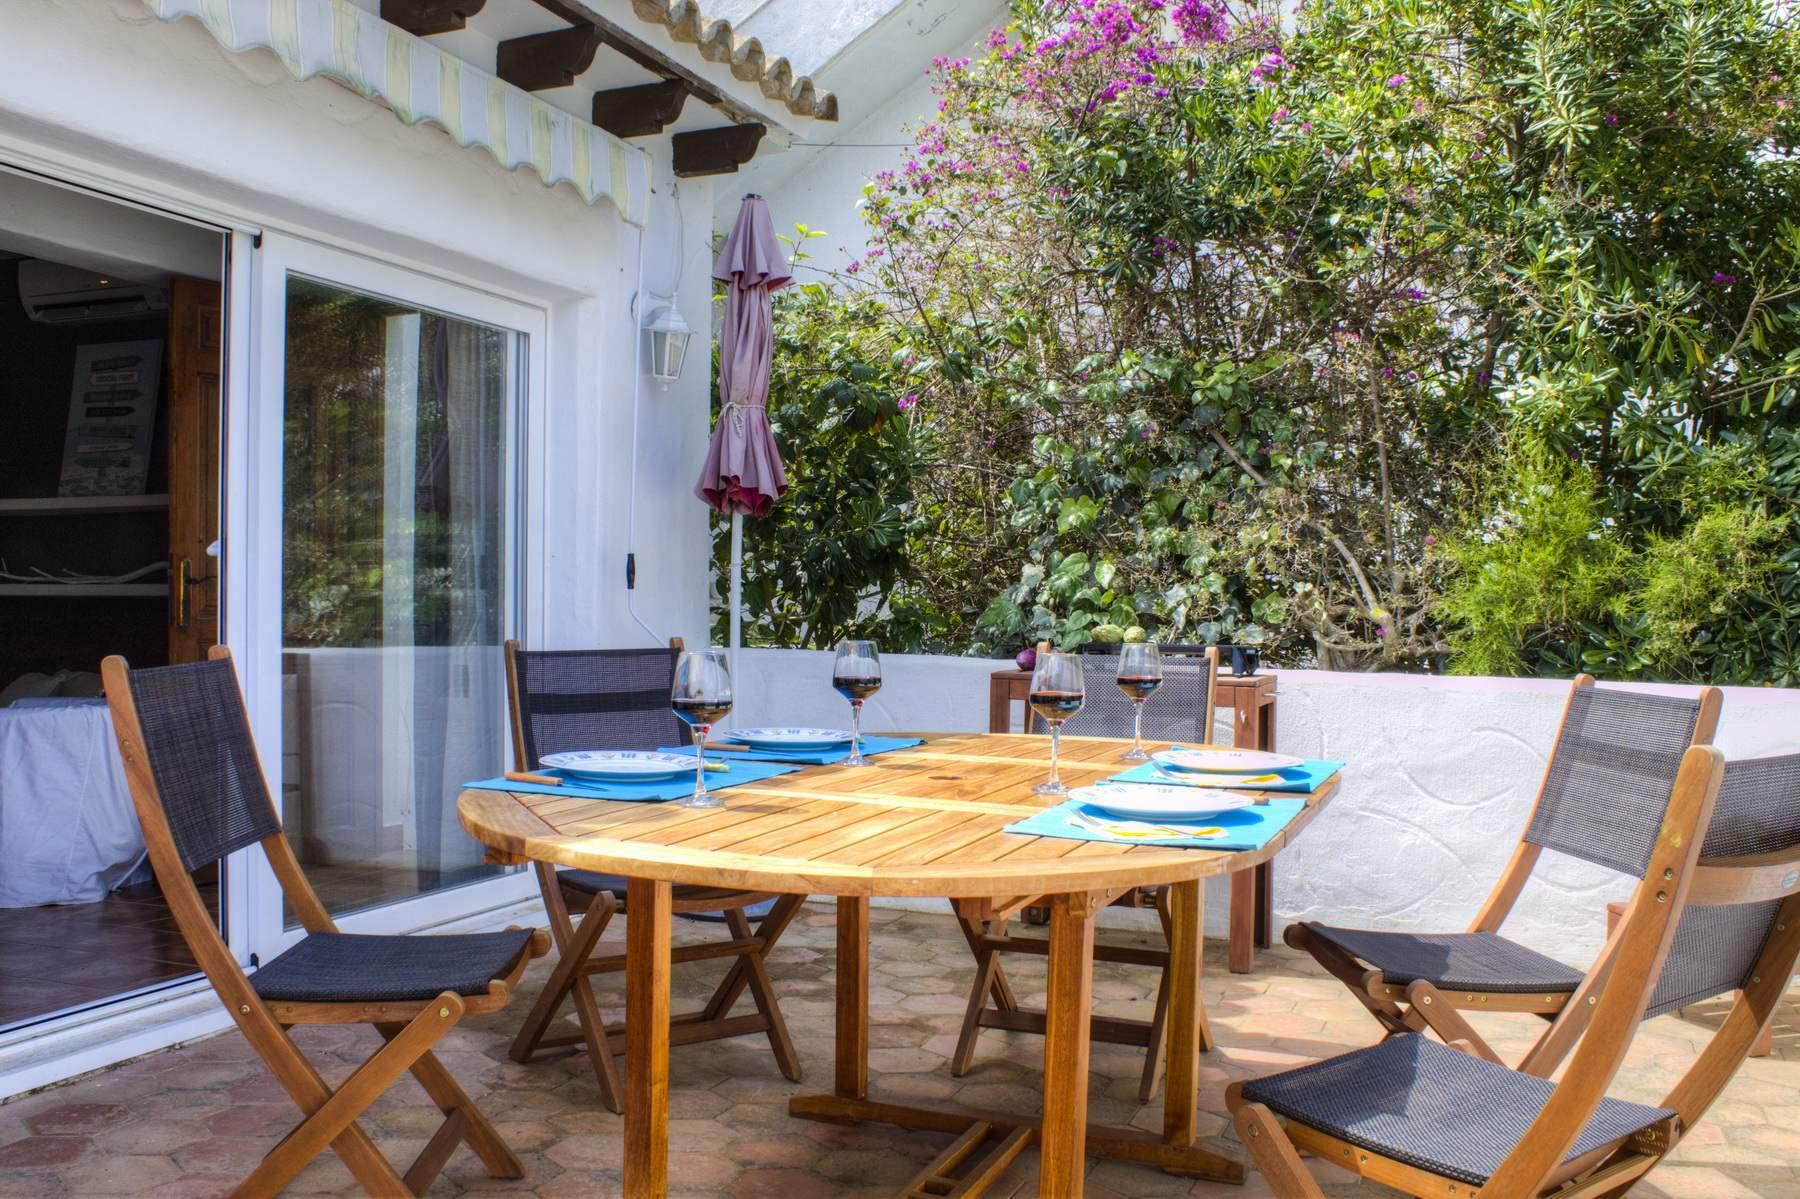 Agradable apartamento en venta en Villotel, Moraira